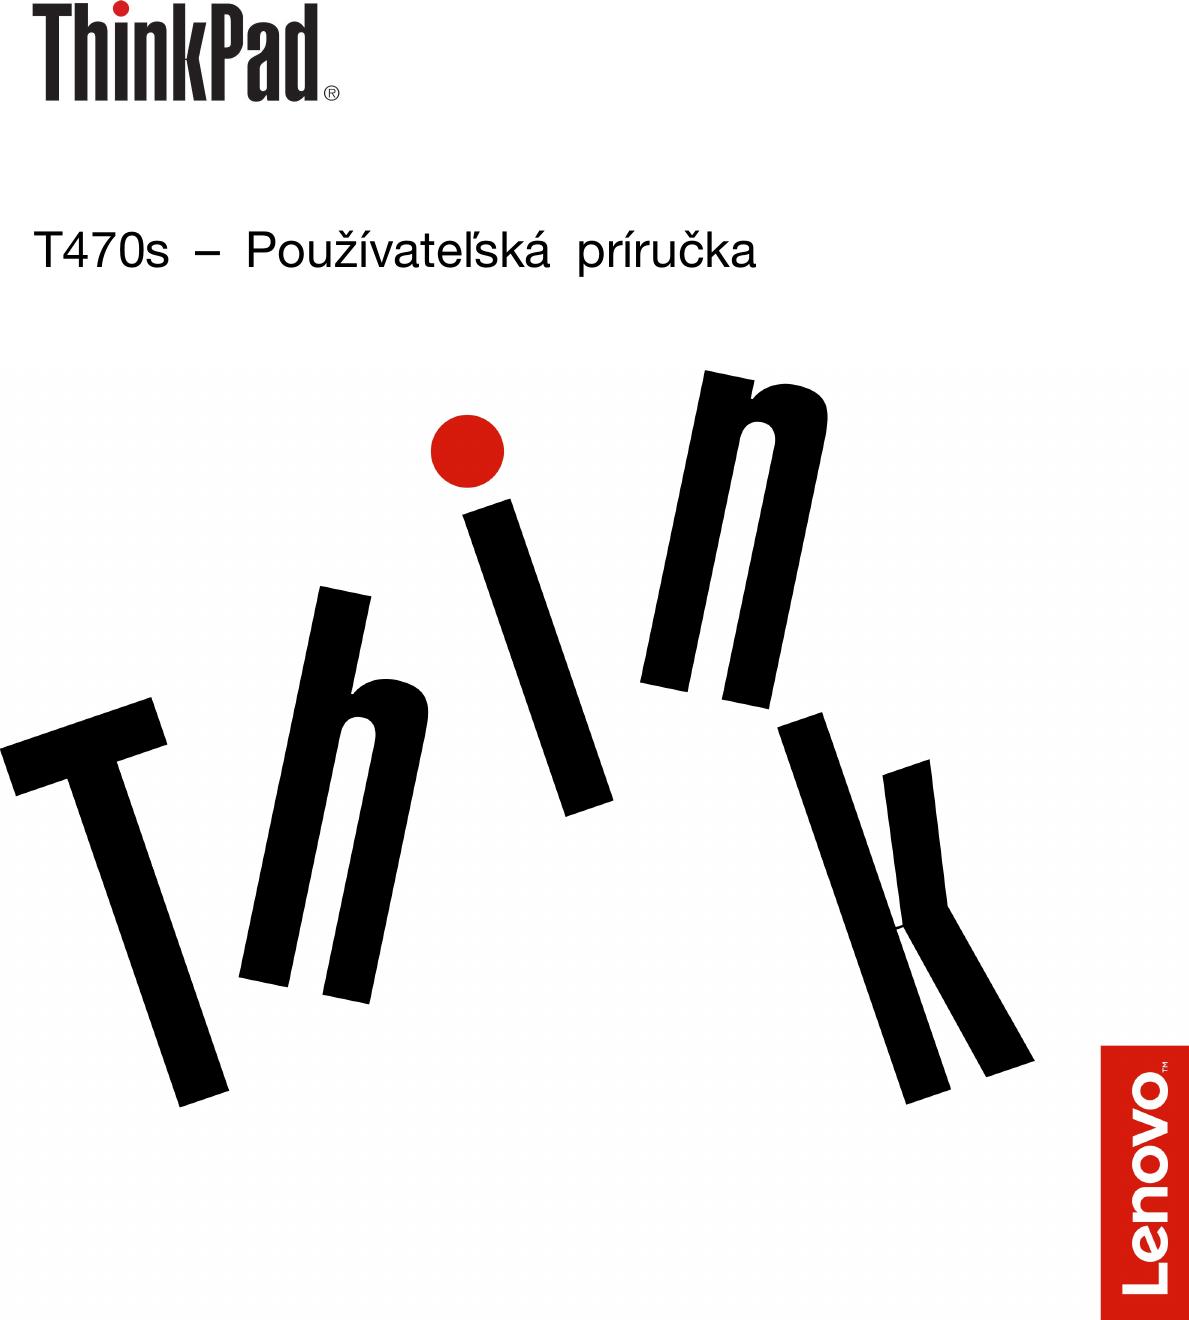 afd624caf Lenovo T470S Ug Sk – Používateľská Príručka User Manual (Slovak) Guide  Think Pad Laptop (type 20HF, 20HG) (Think Pad) Type 20HG